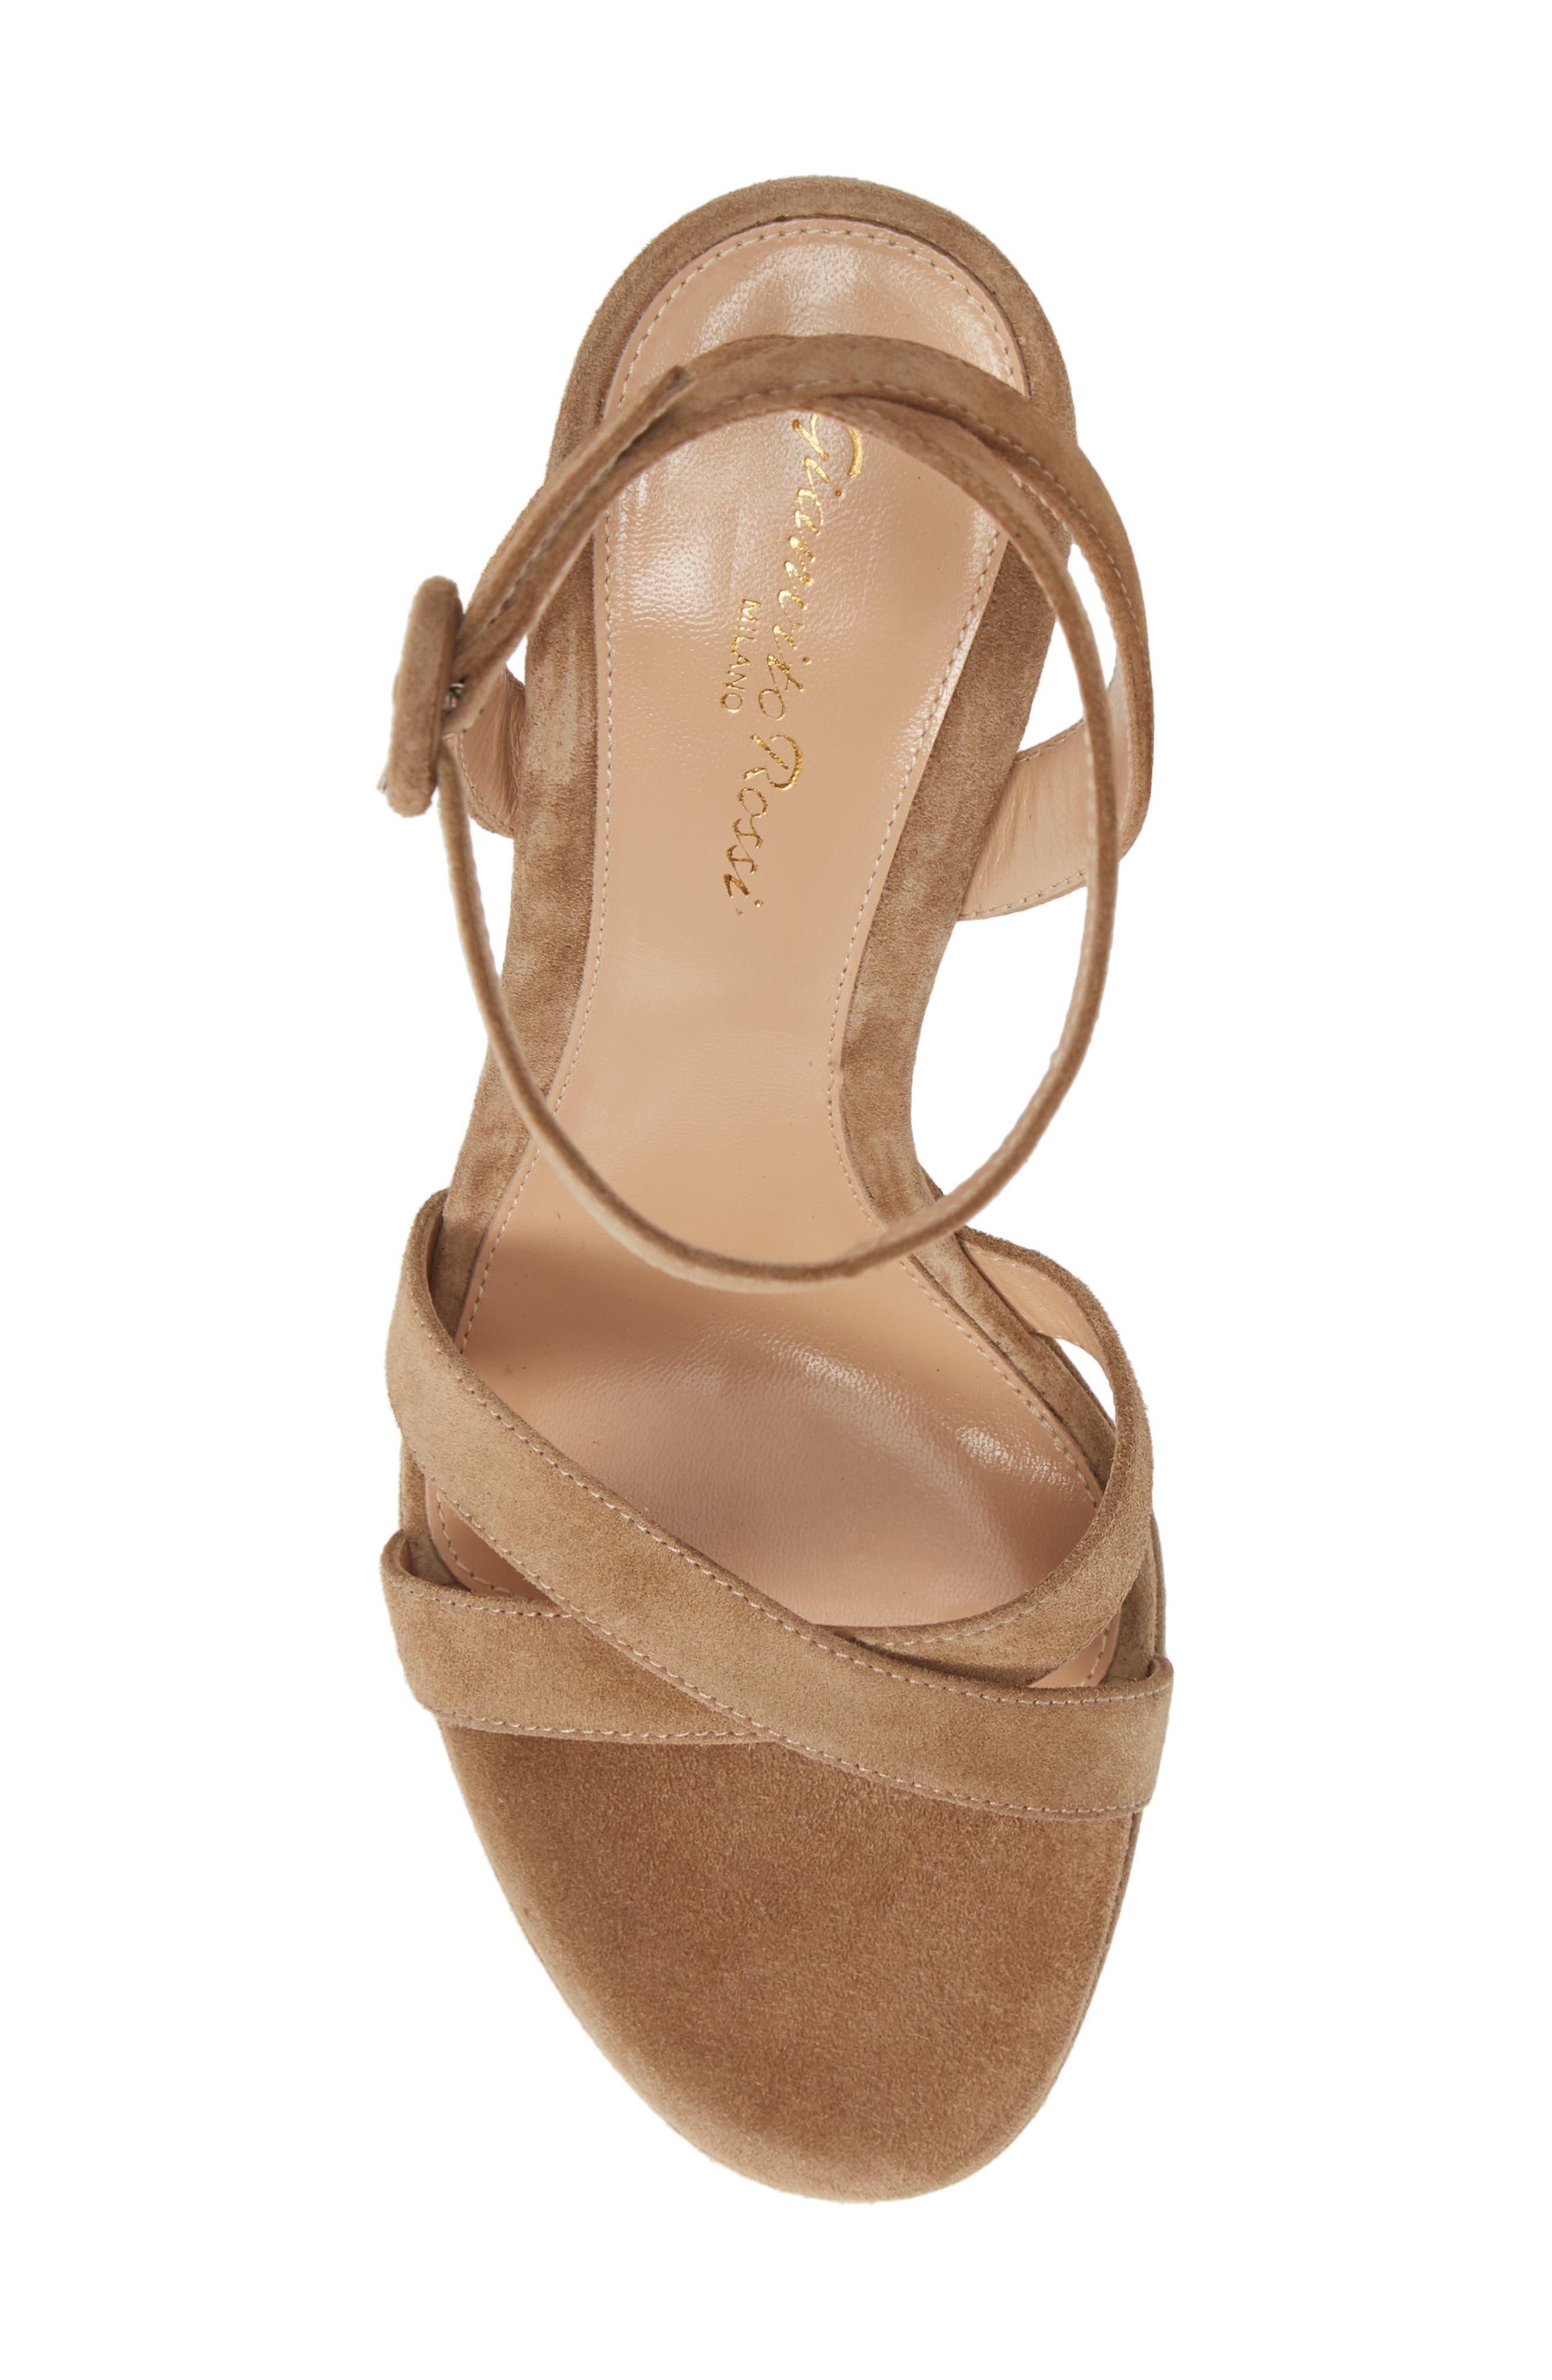 GIANVITO ROSSI, Ankle Strap Platform Sandal, Alternate thumbnail 5, color, CAMEL SUEDE